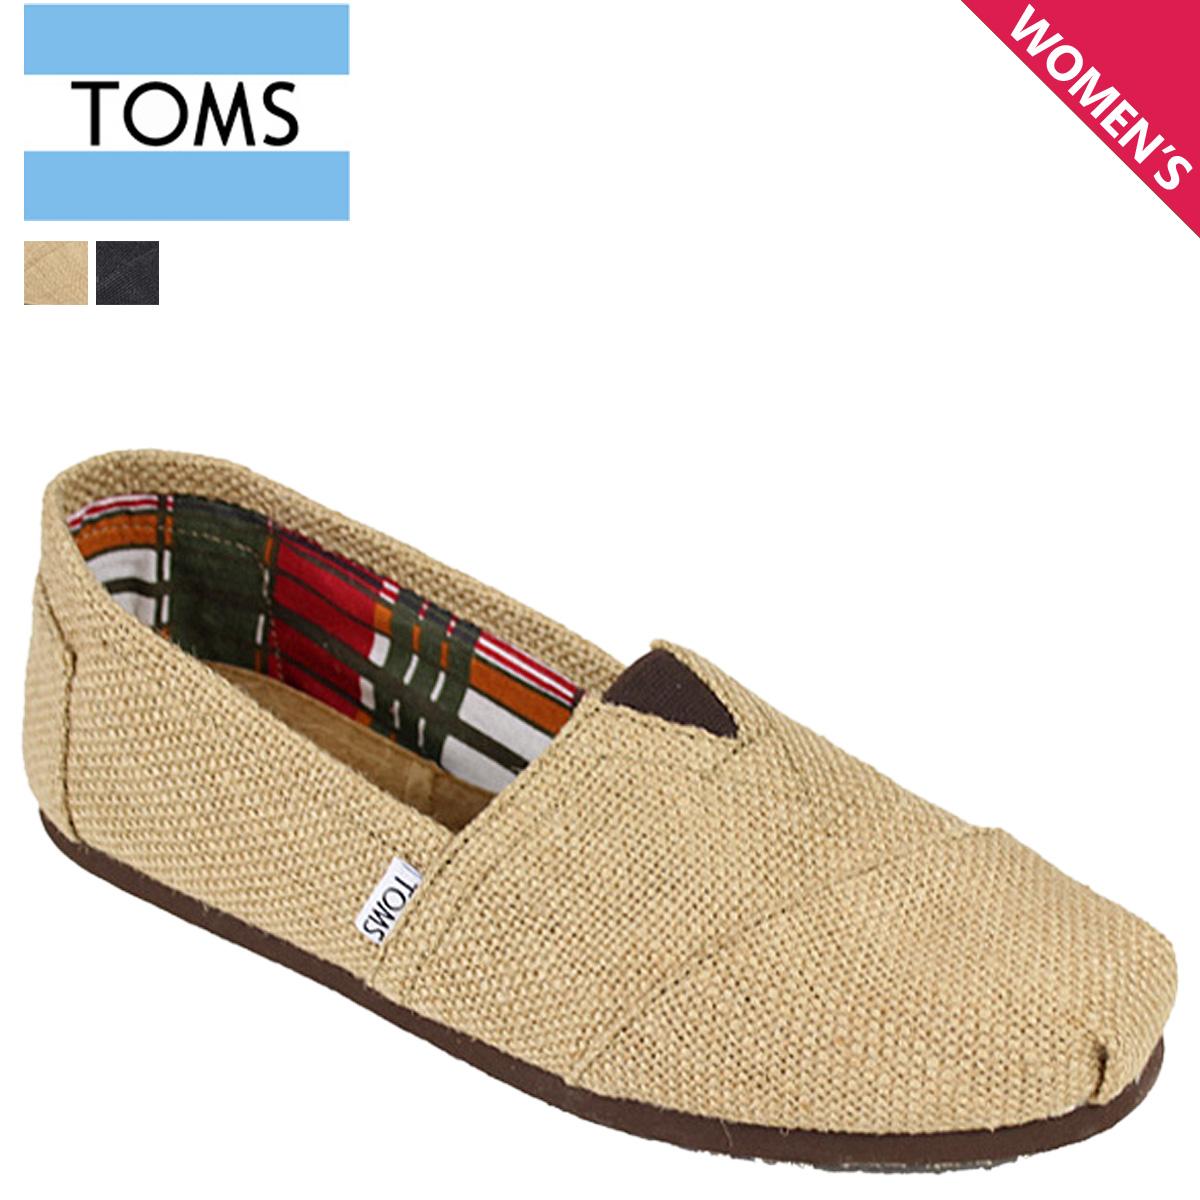 SNEAK ONLINE SHOP: TOMS Men Tom's Shoes Slip-ons TOMS